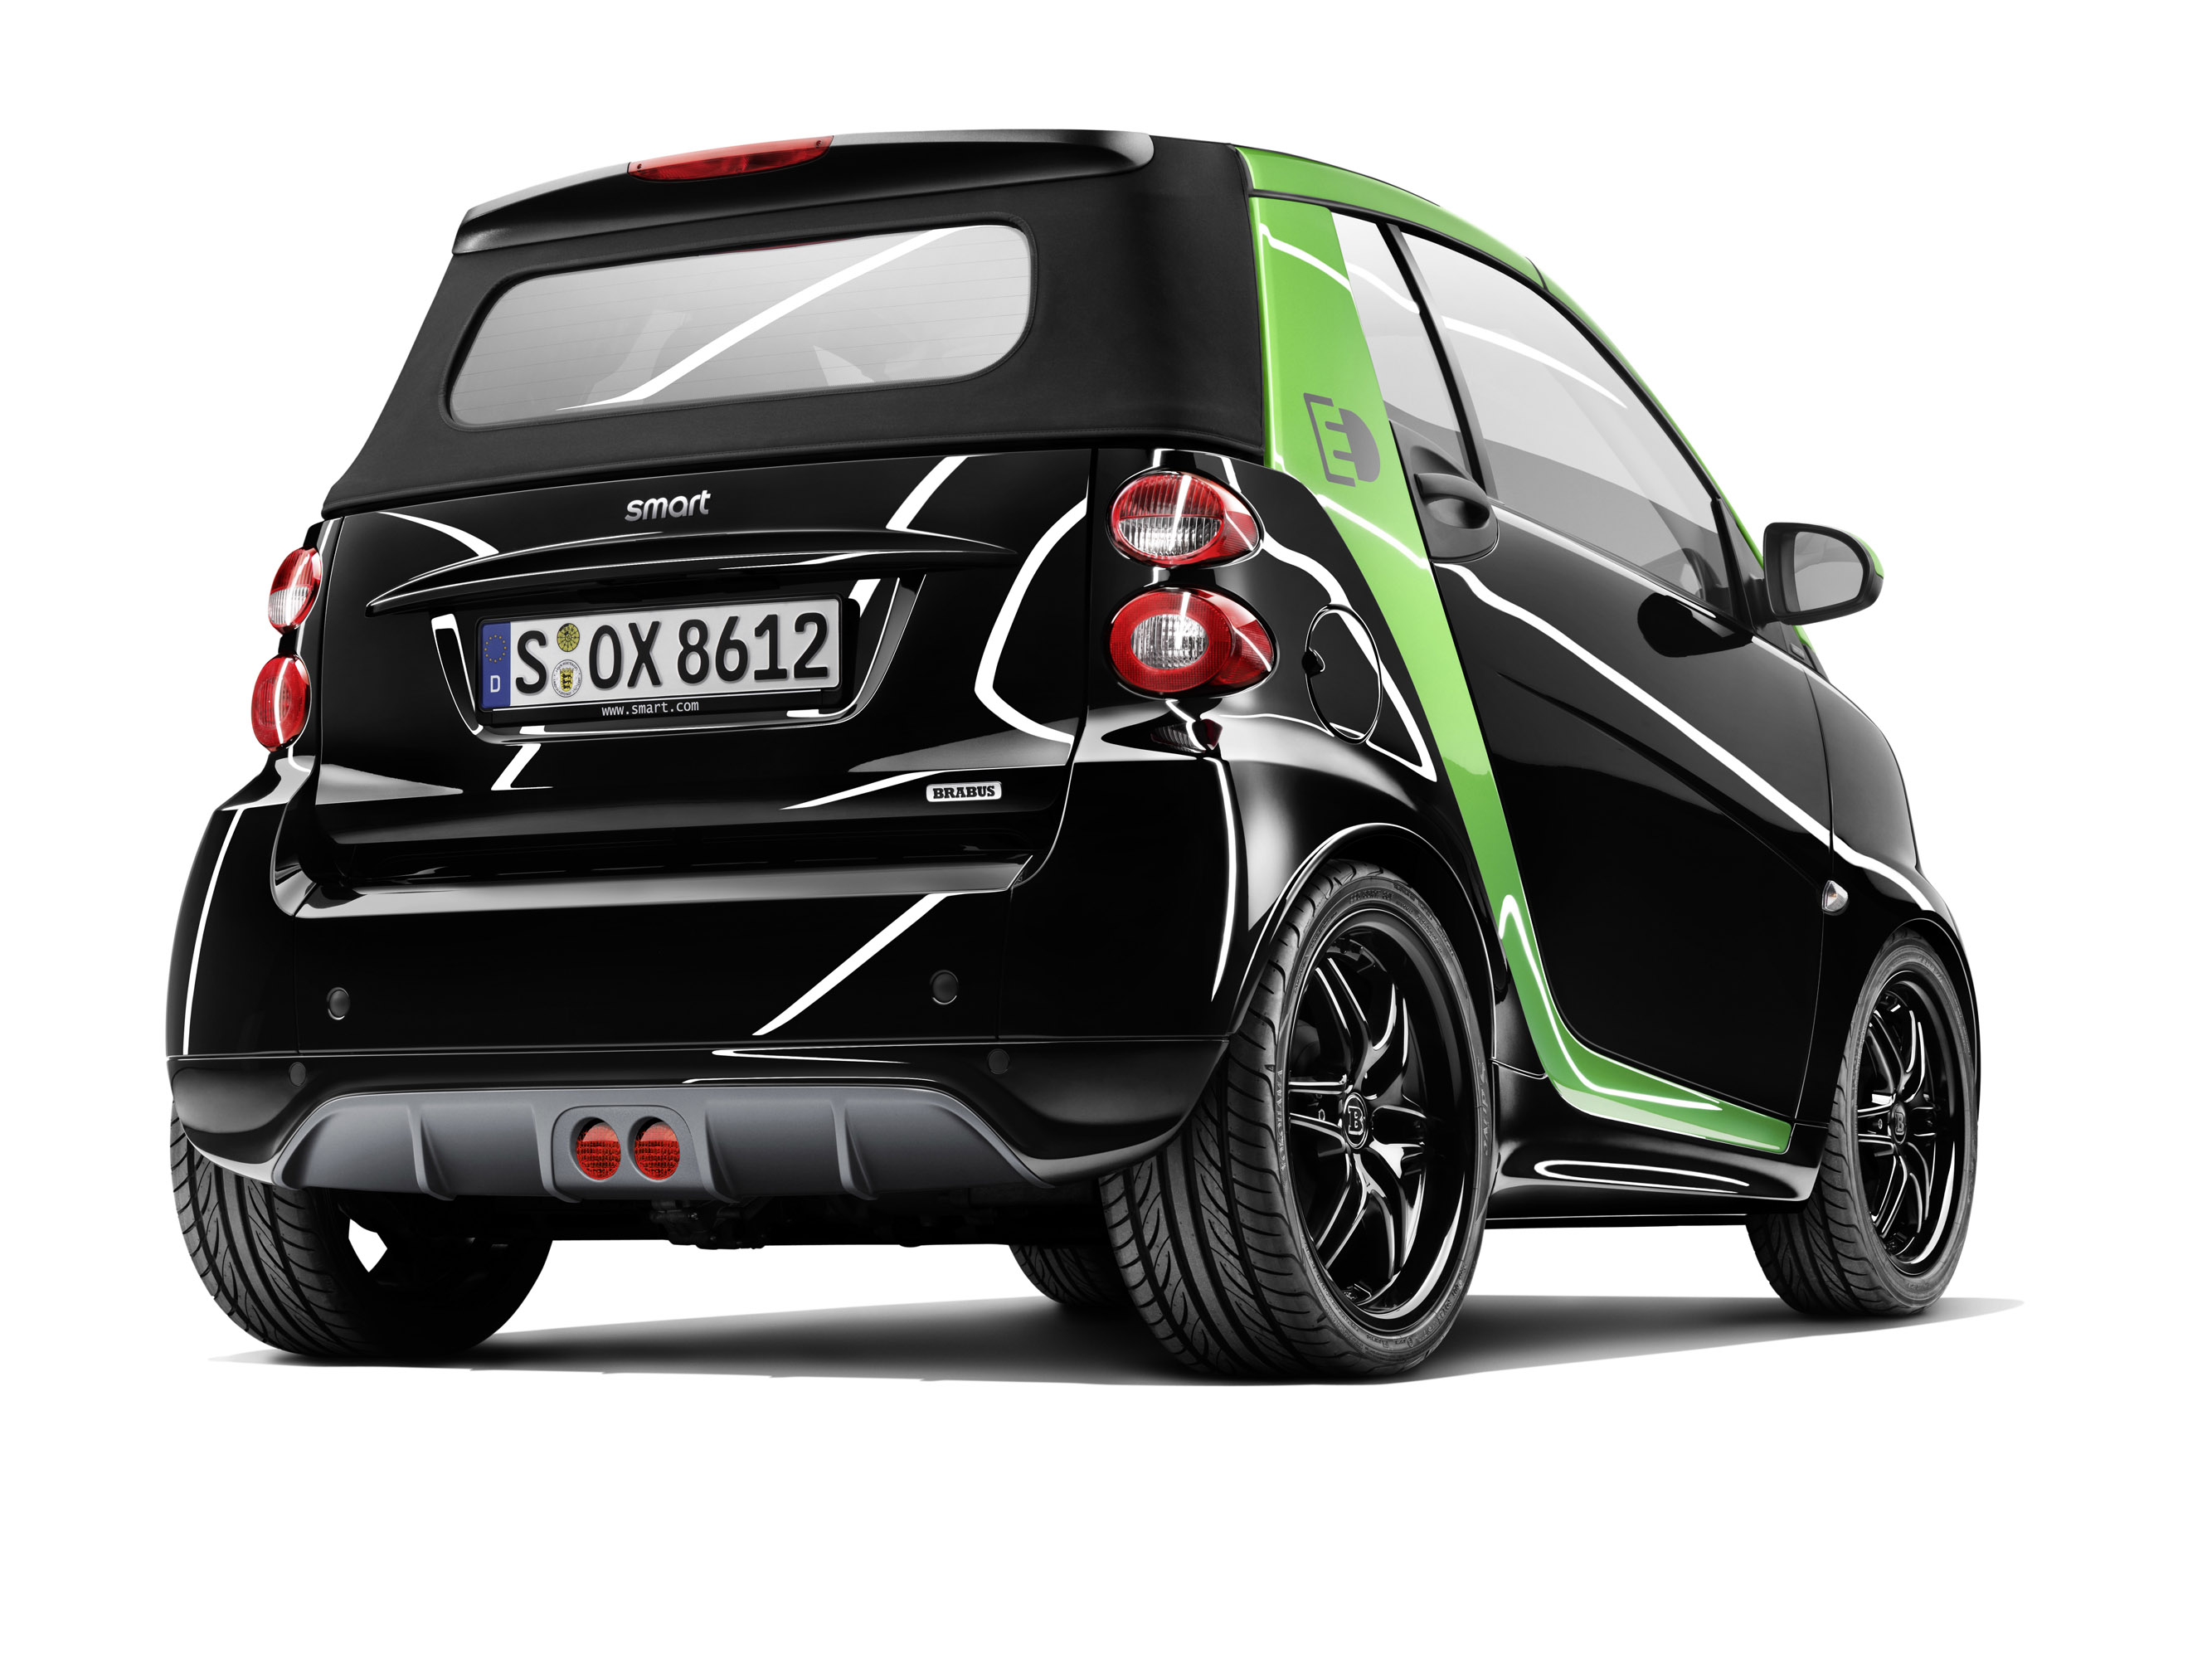 brabus smart electric drive and smart ebike. Black Bedroom Furniture Sets. Home Design Ideas